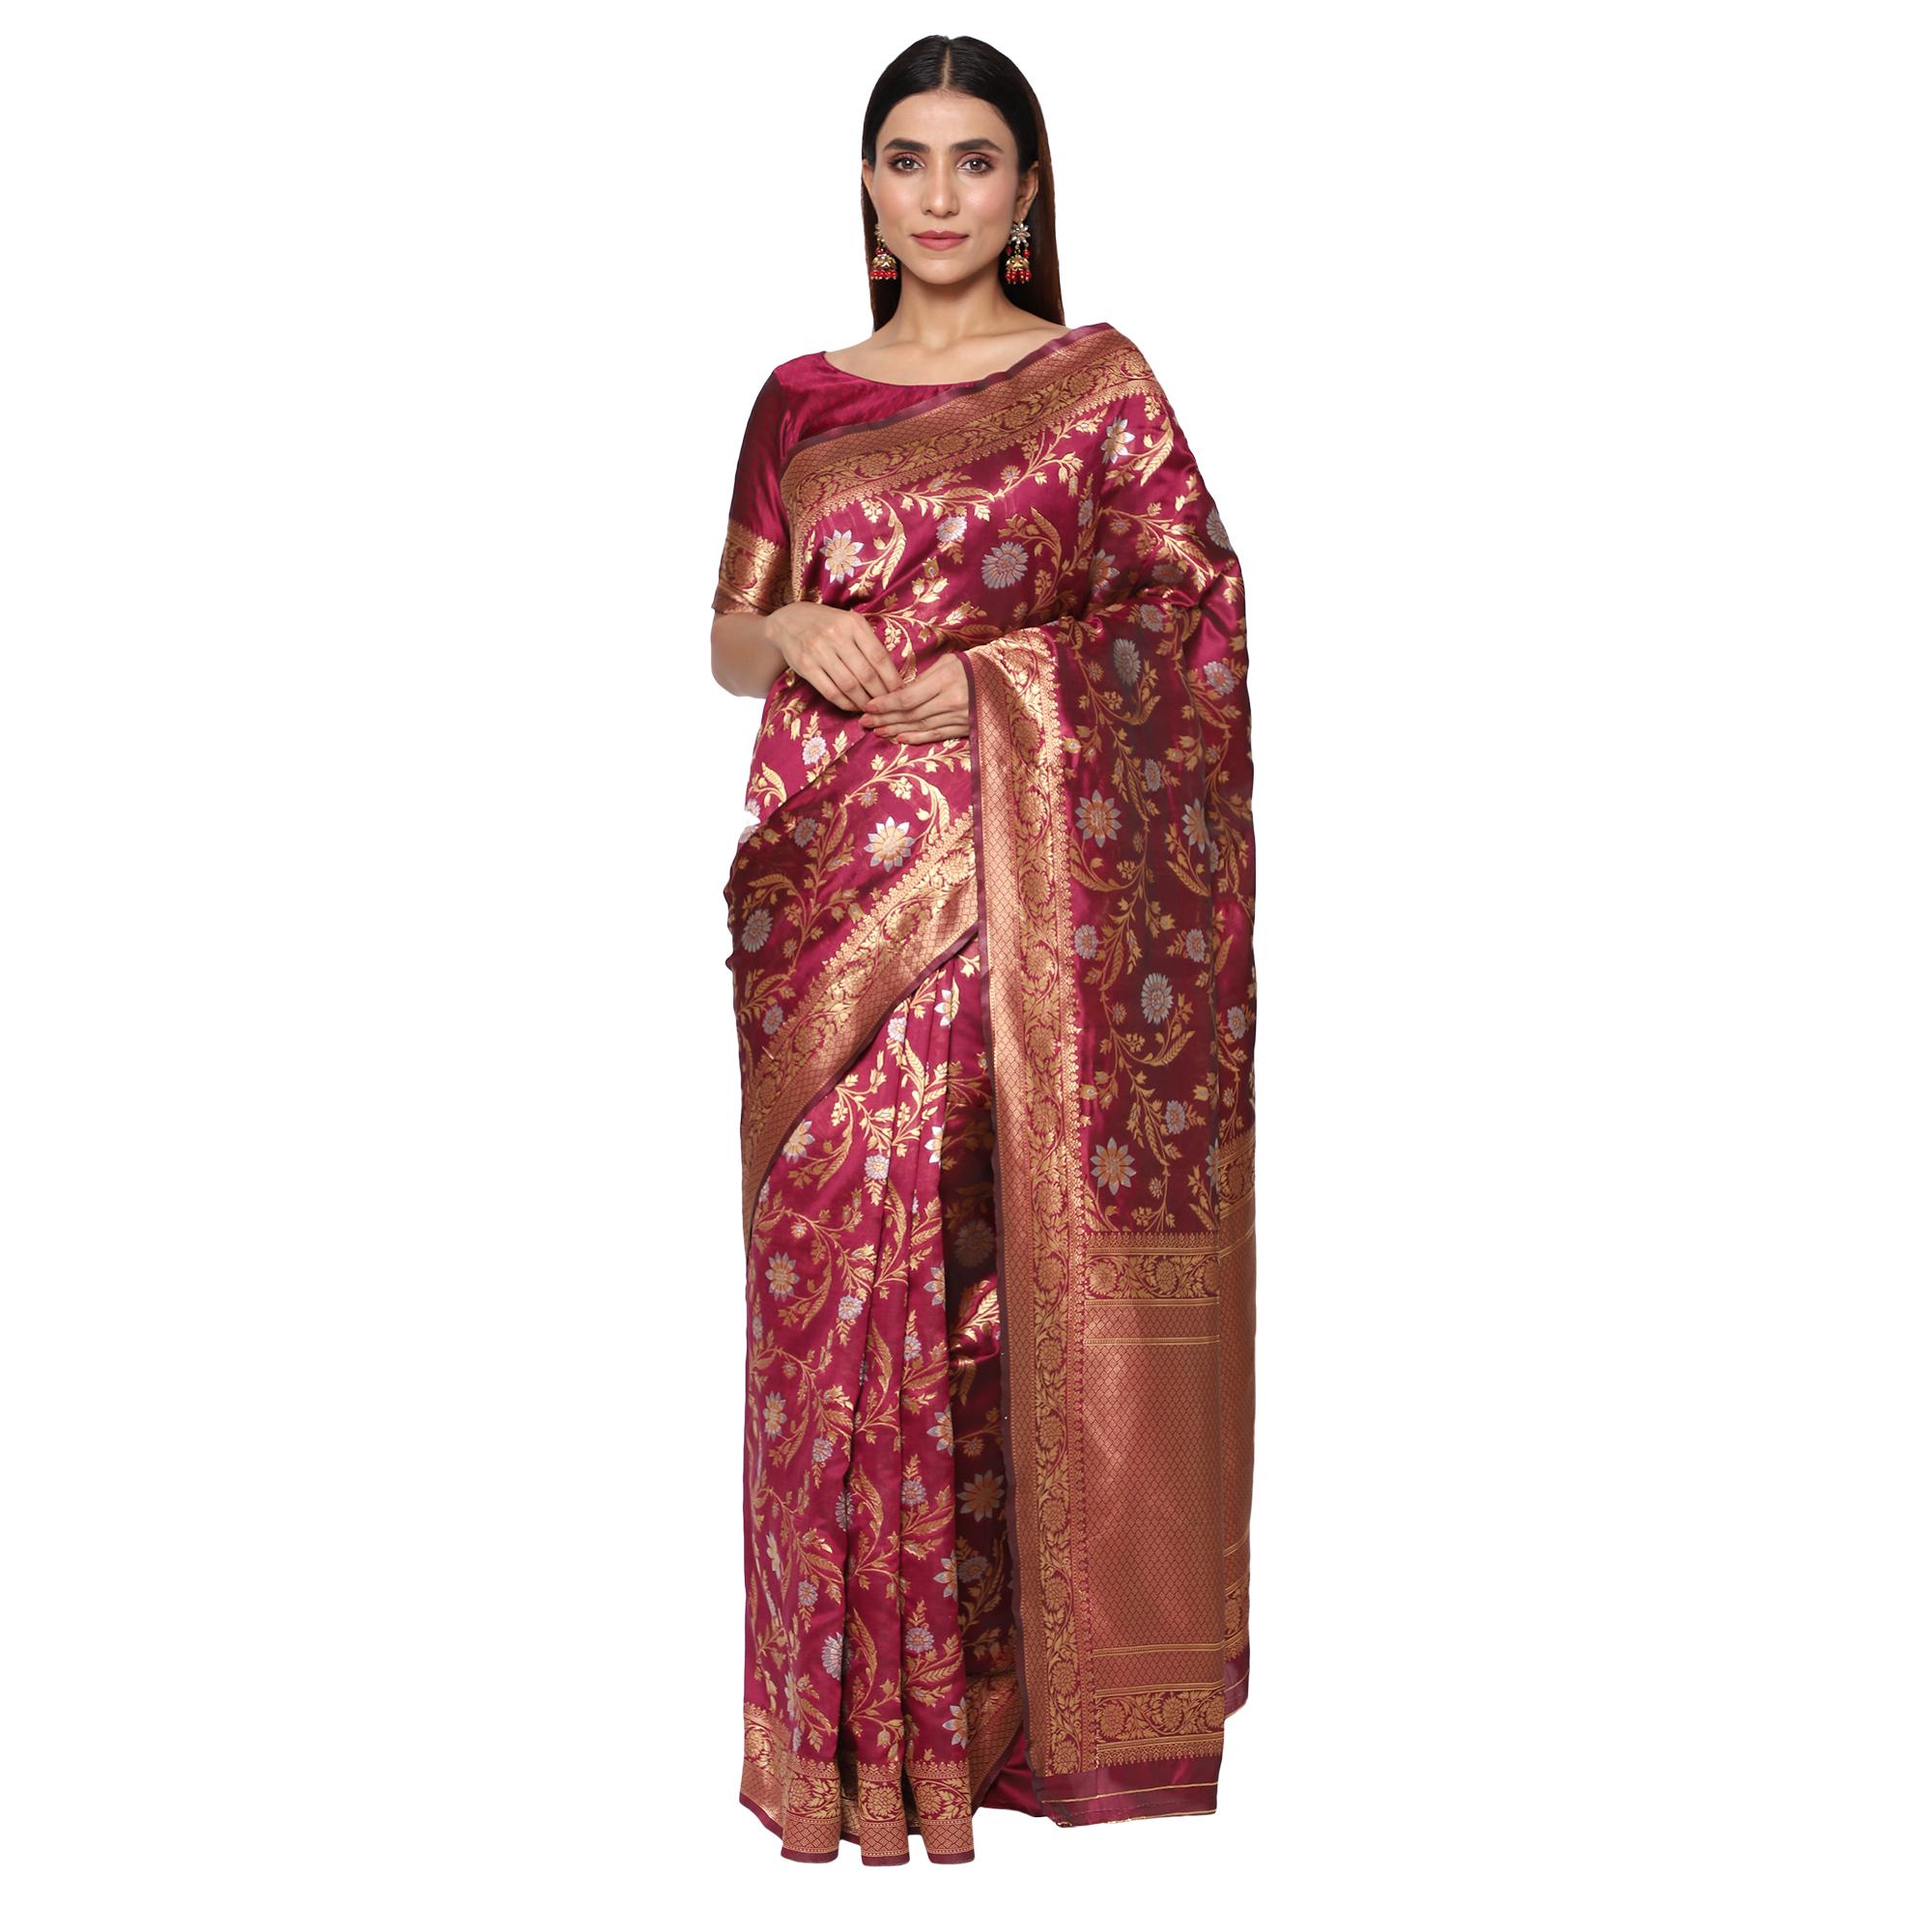 Glemora Wine Beautiful Ethnic Wear Silk Blend Banarasi Traditional Saree